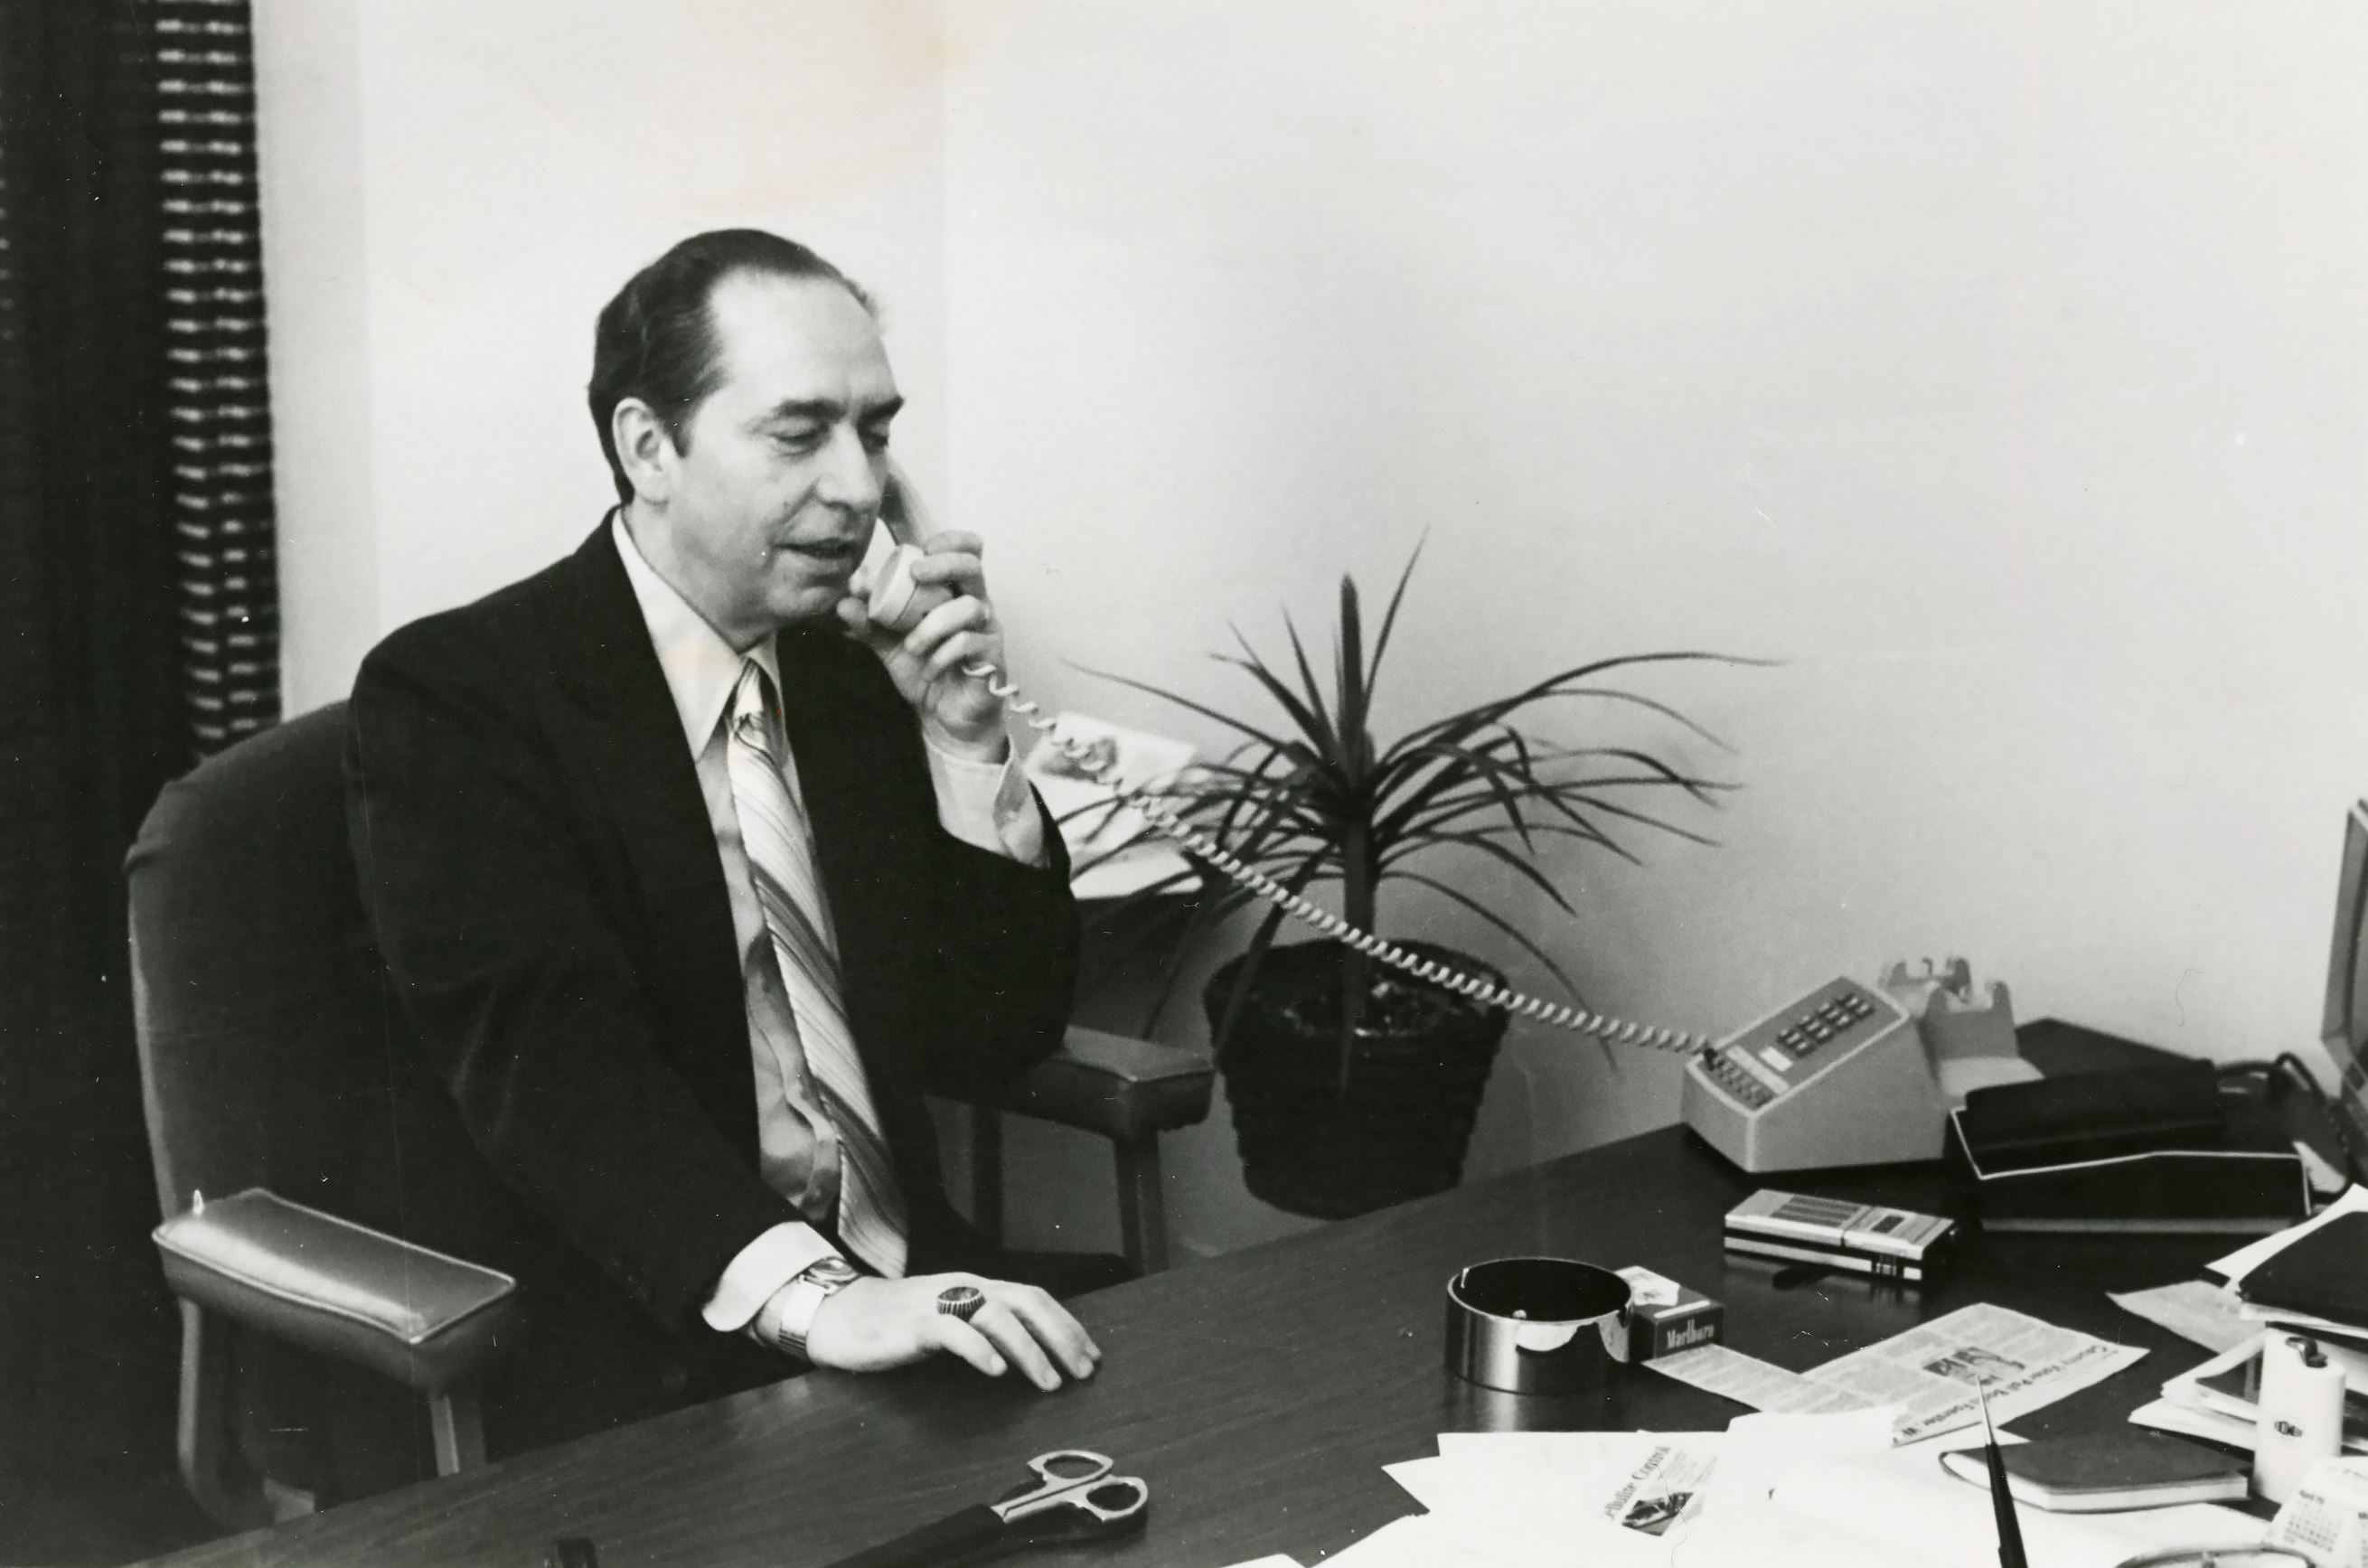 Lloyd-Fuge-2-1 Lloyd H. Fuge, mayor of Clairton from 1973 to 1977